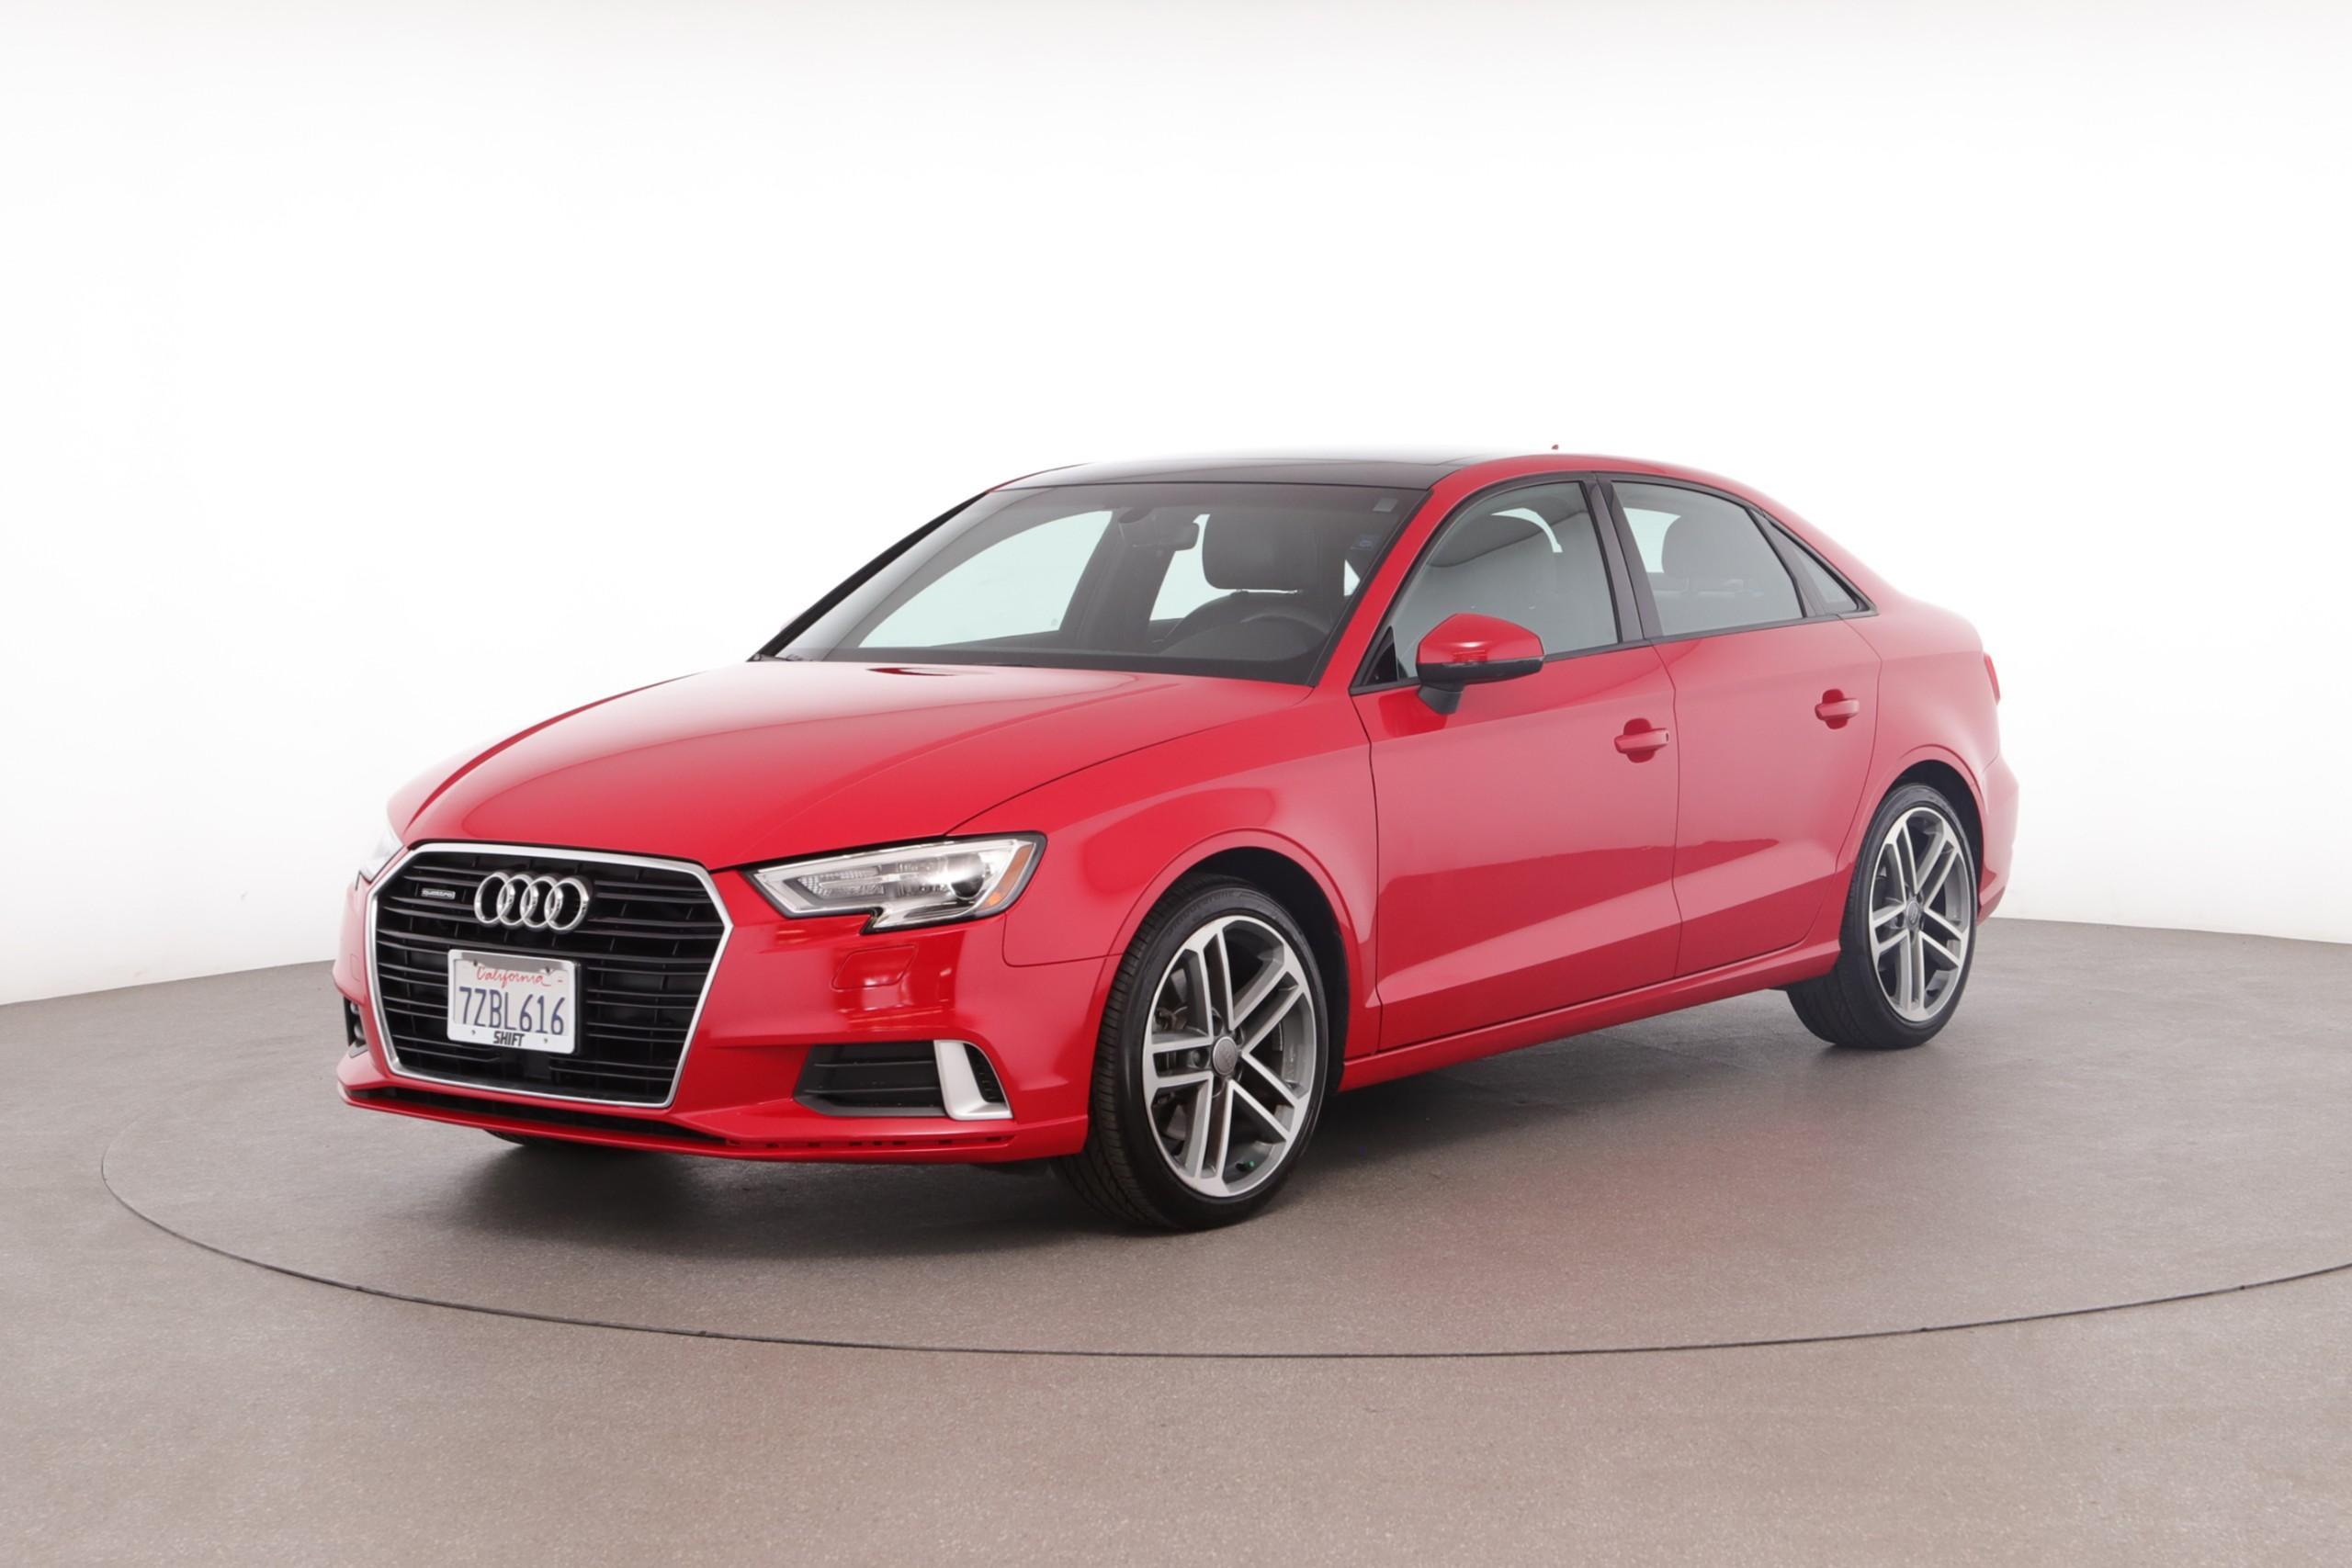 2017 Audi A3 Premium (from $20,950)